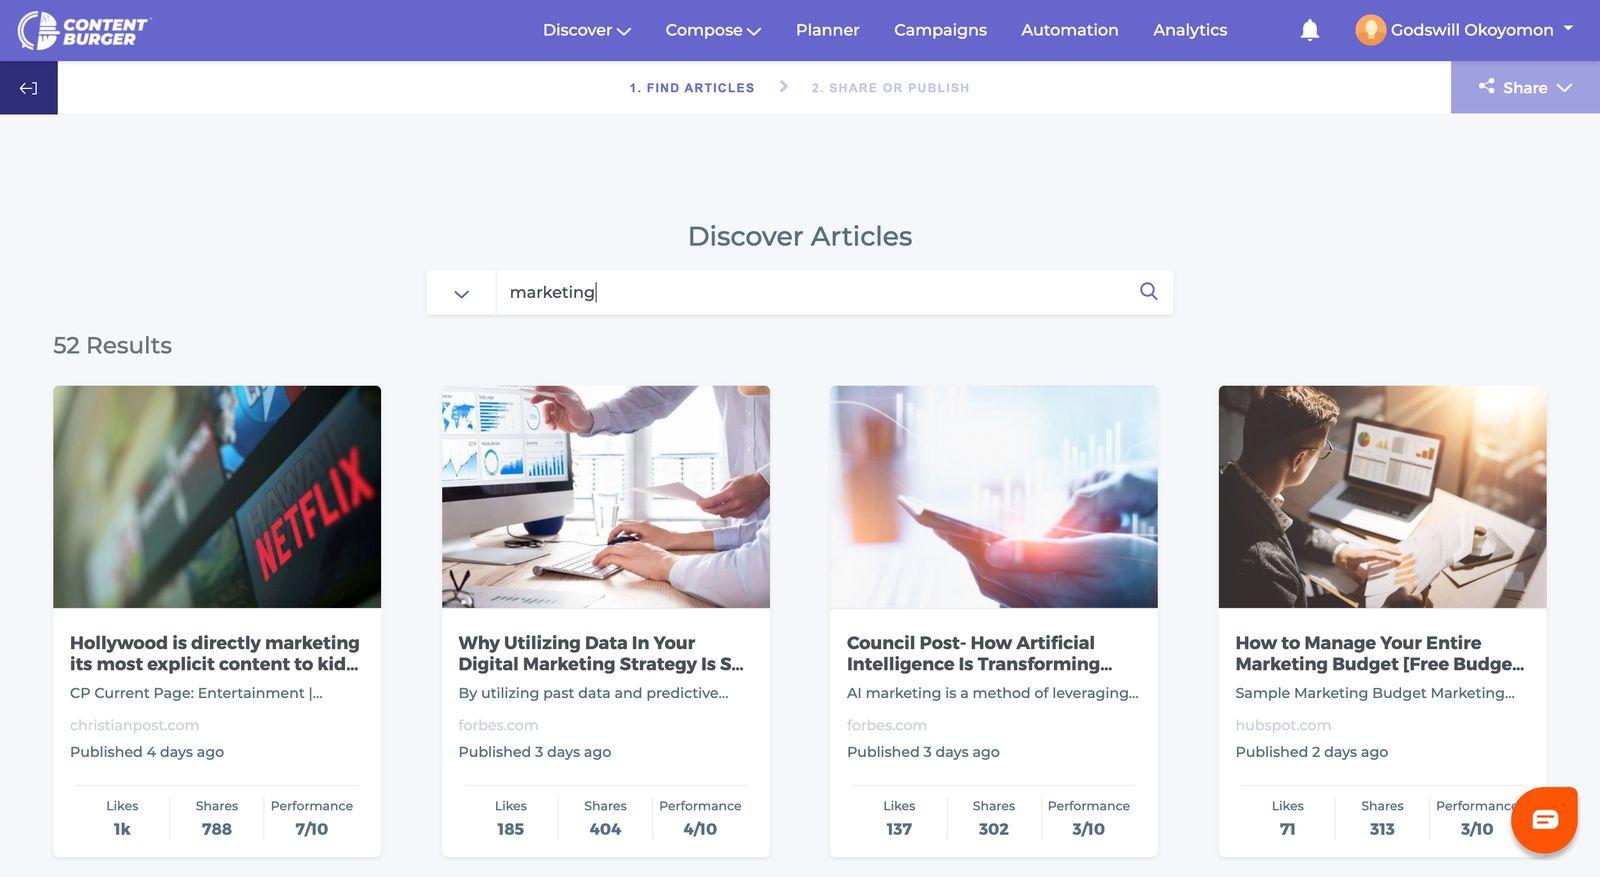 ContentBurger-Discovery